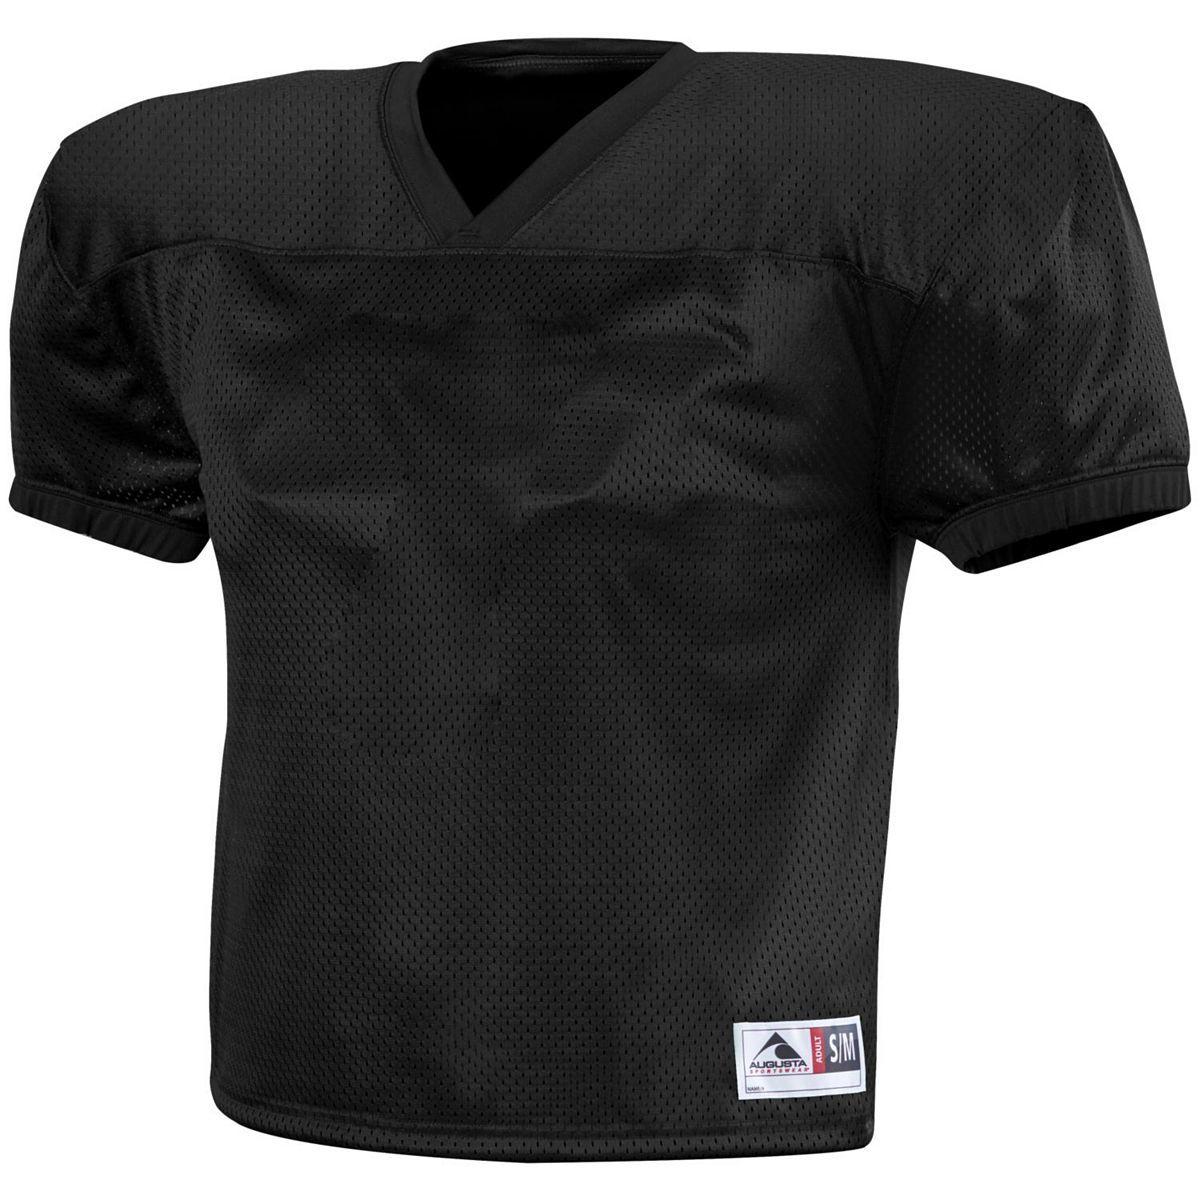 Ladies Augusta Sportswear Dash Short Sleeve Football Uni Practice Jersey Black